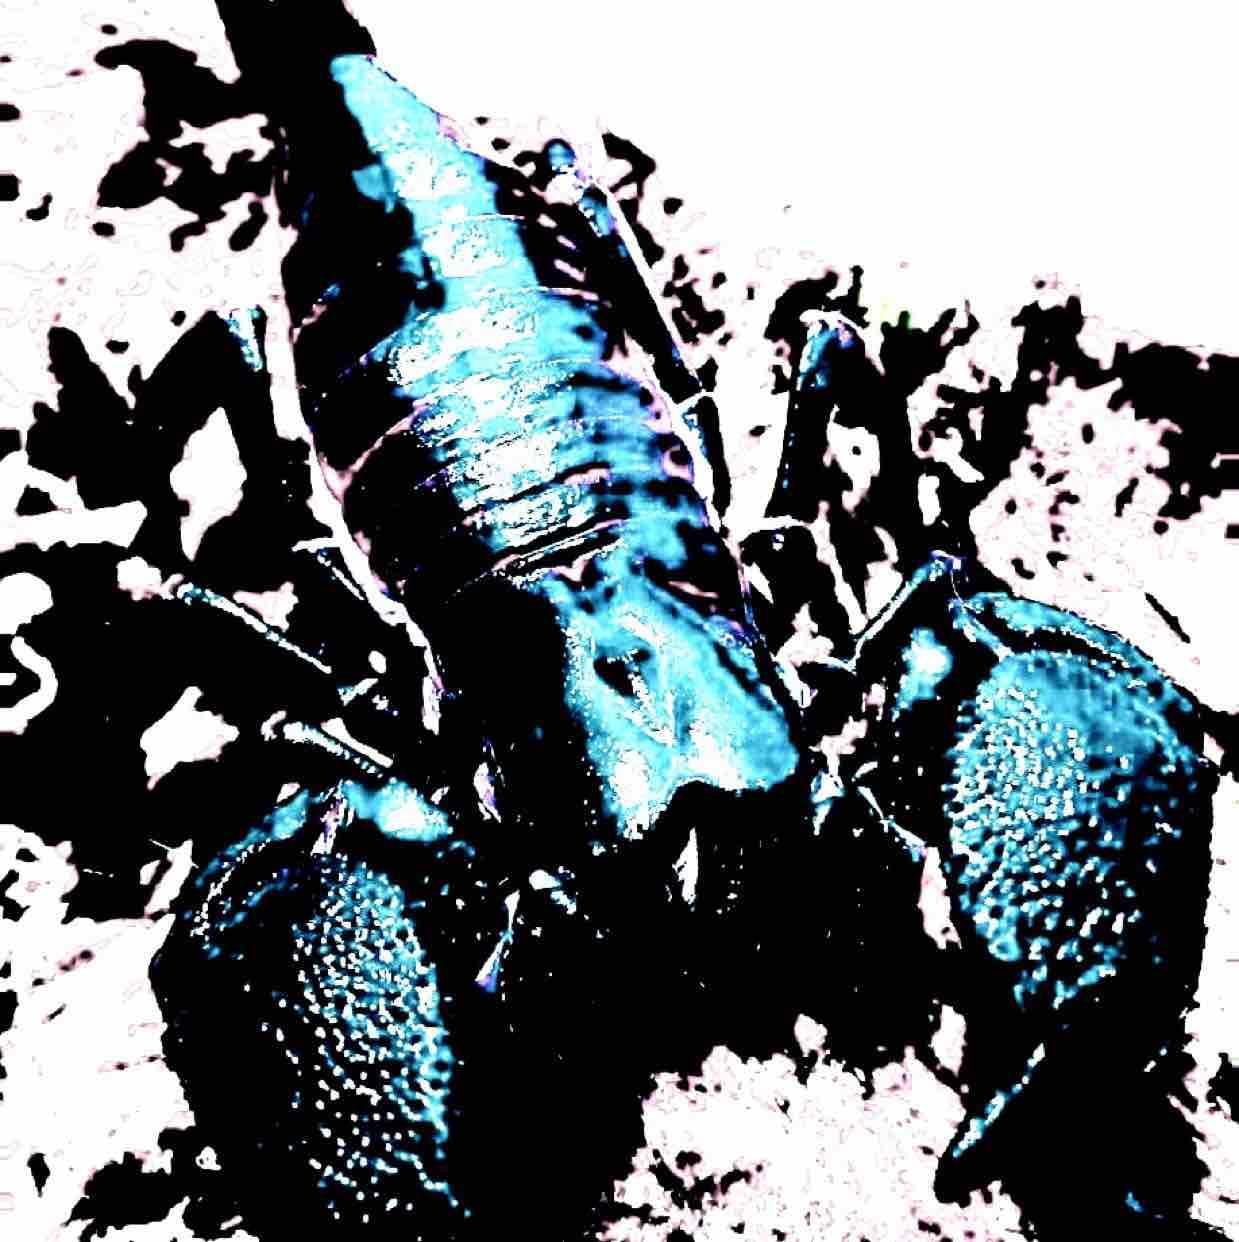 Scorpionartist